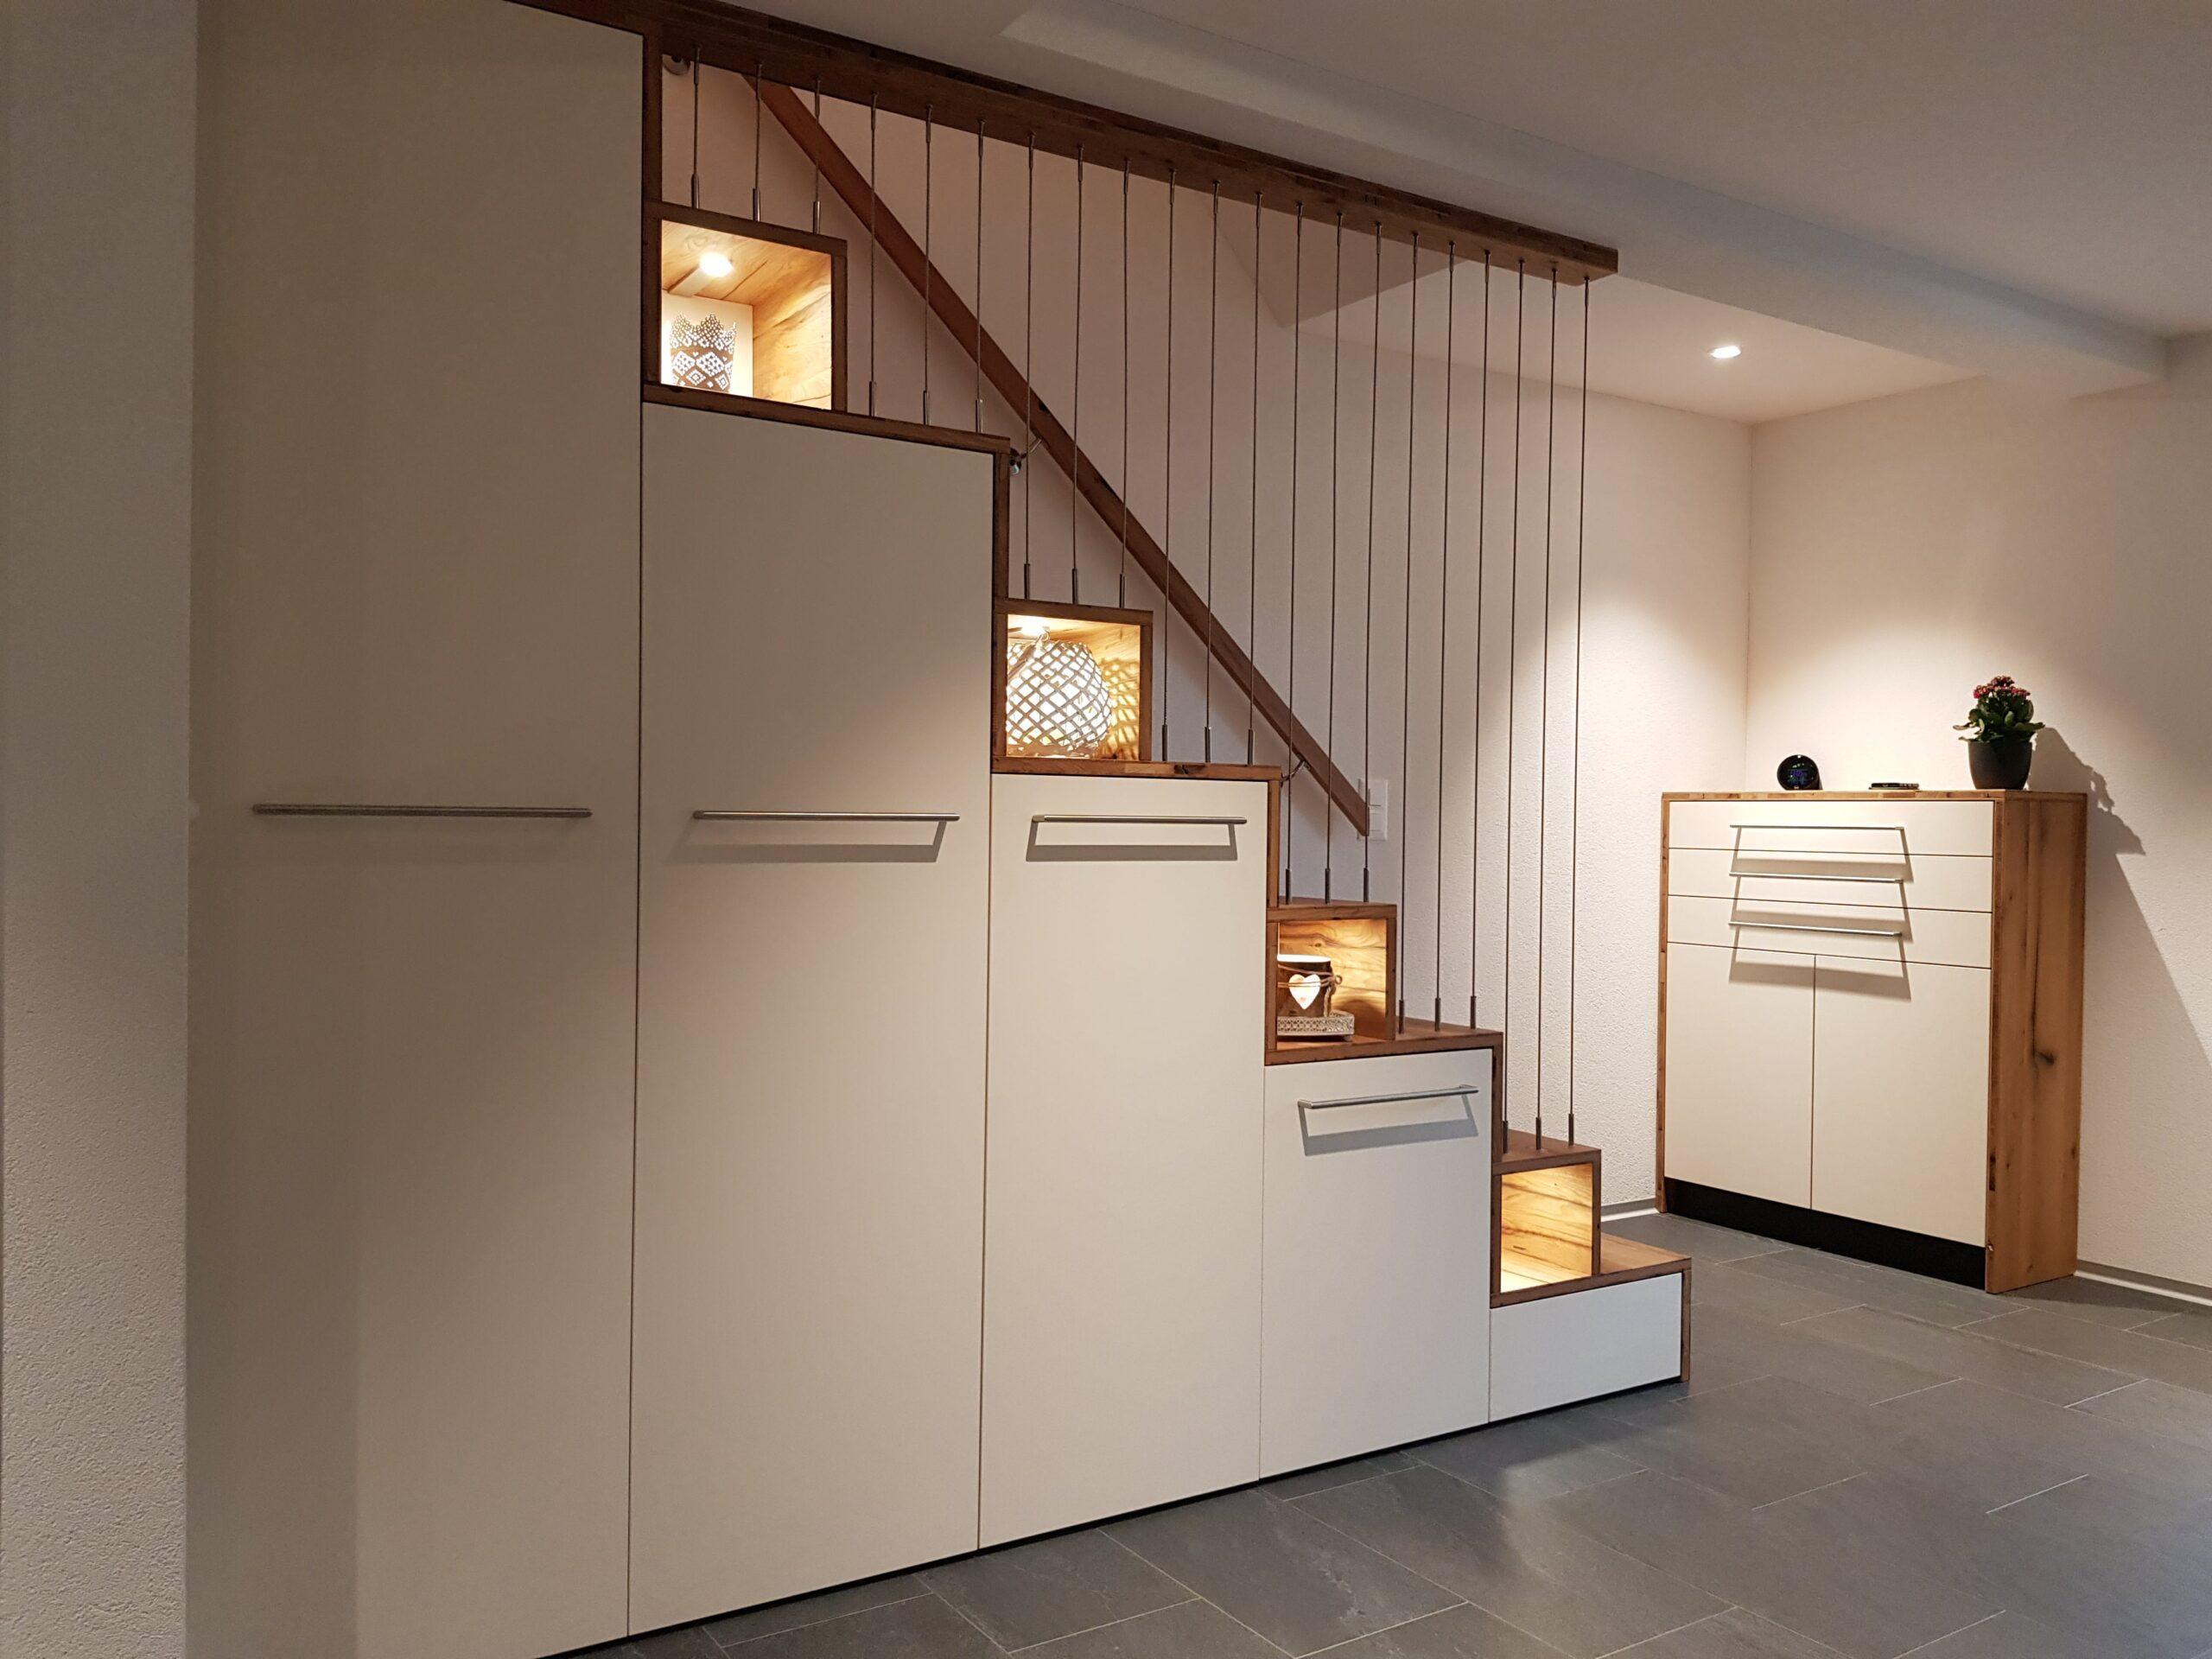 Wooddesign_Treppen_Teppengeländer_Holztreppen_Treppenverkleidung_Treppenmöbel (11)-min